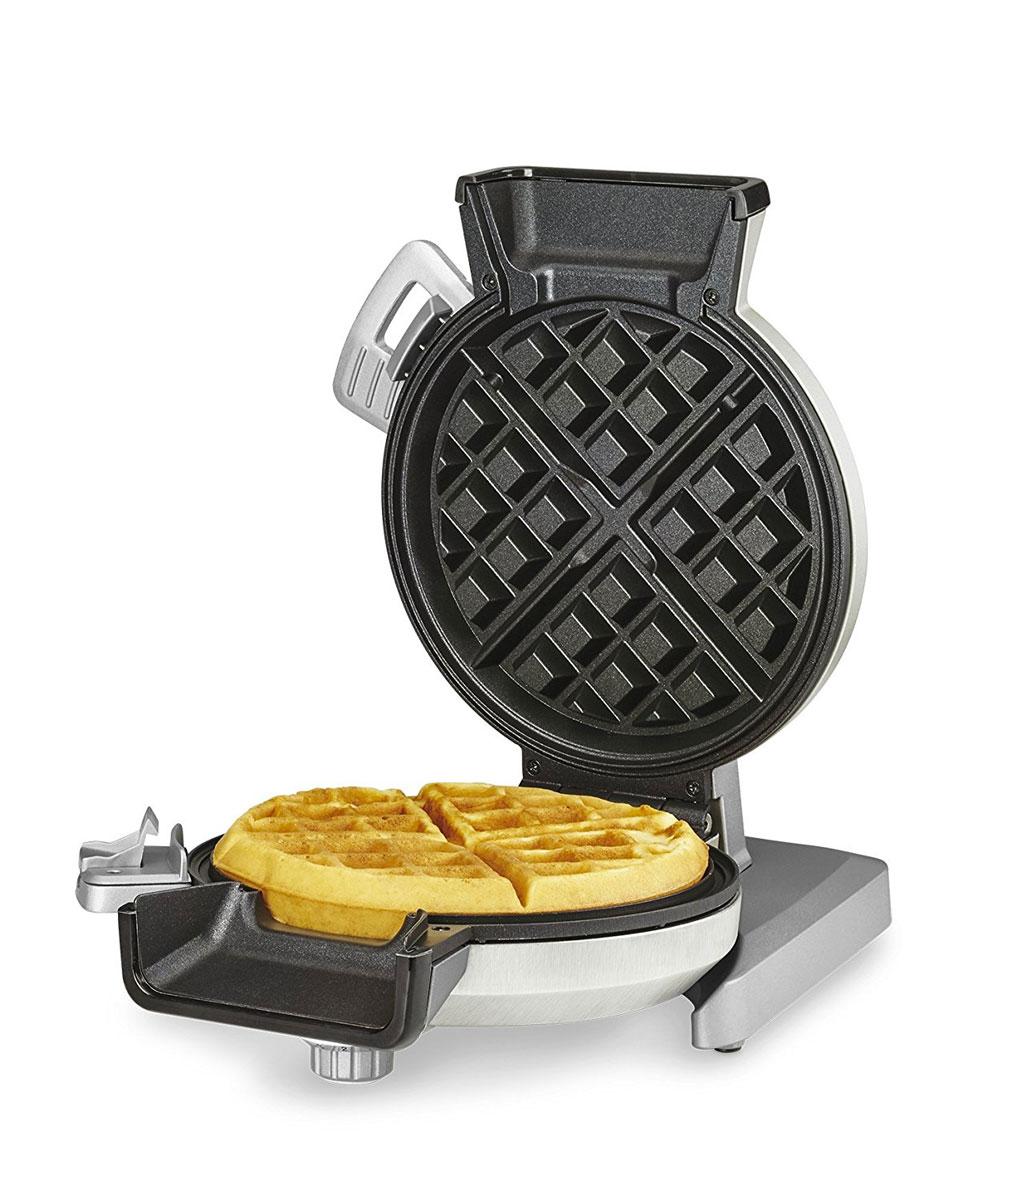 Best Belgian Waffle Recipe With Cake Flour